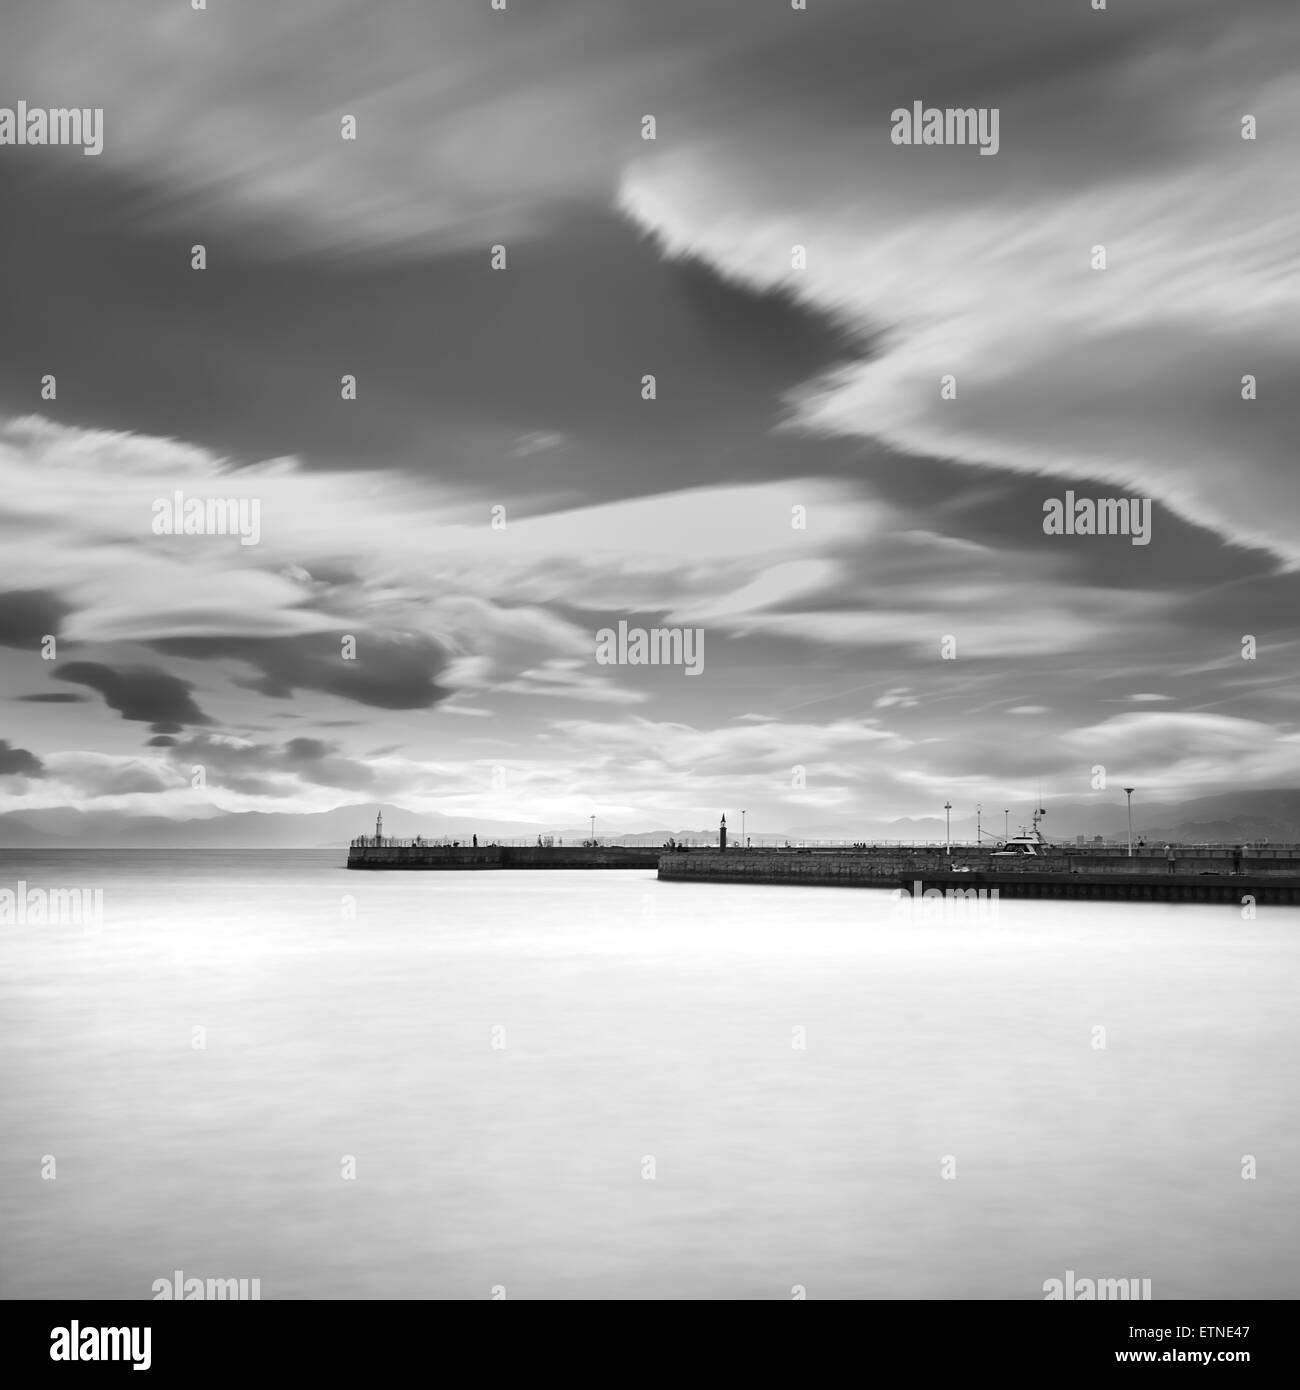 Enoshima pier and clouded sky, Kanagawa Prefecture, Japan - Stock Image